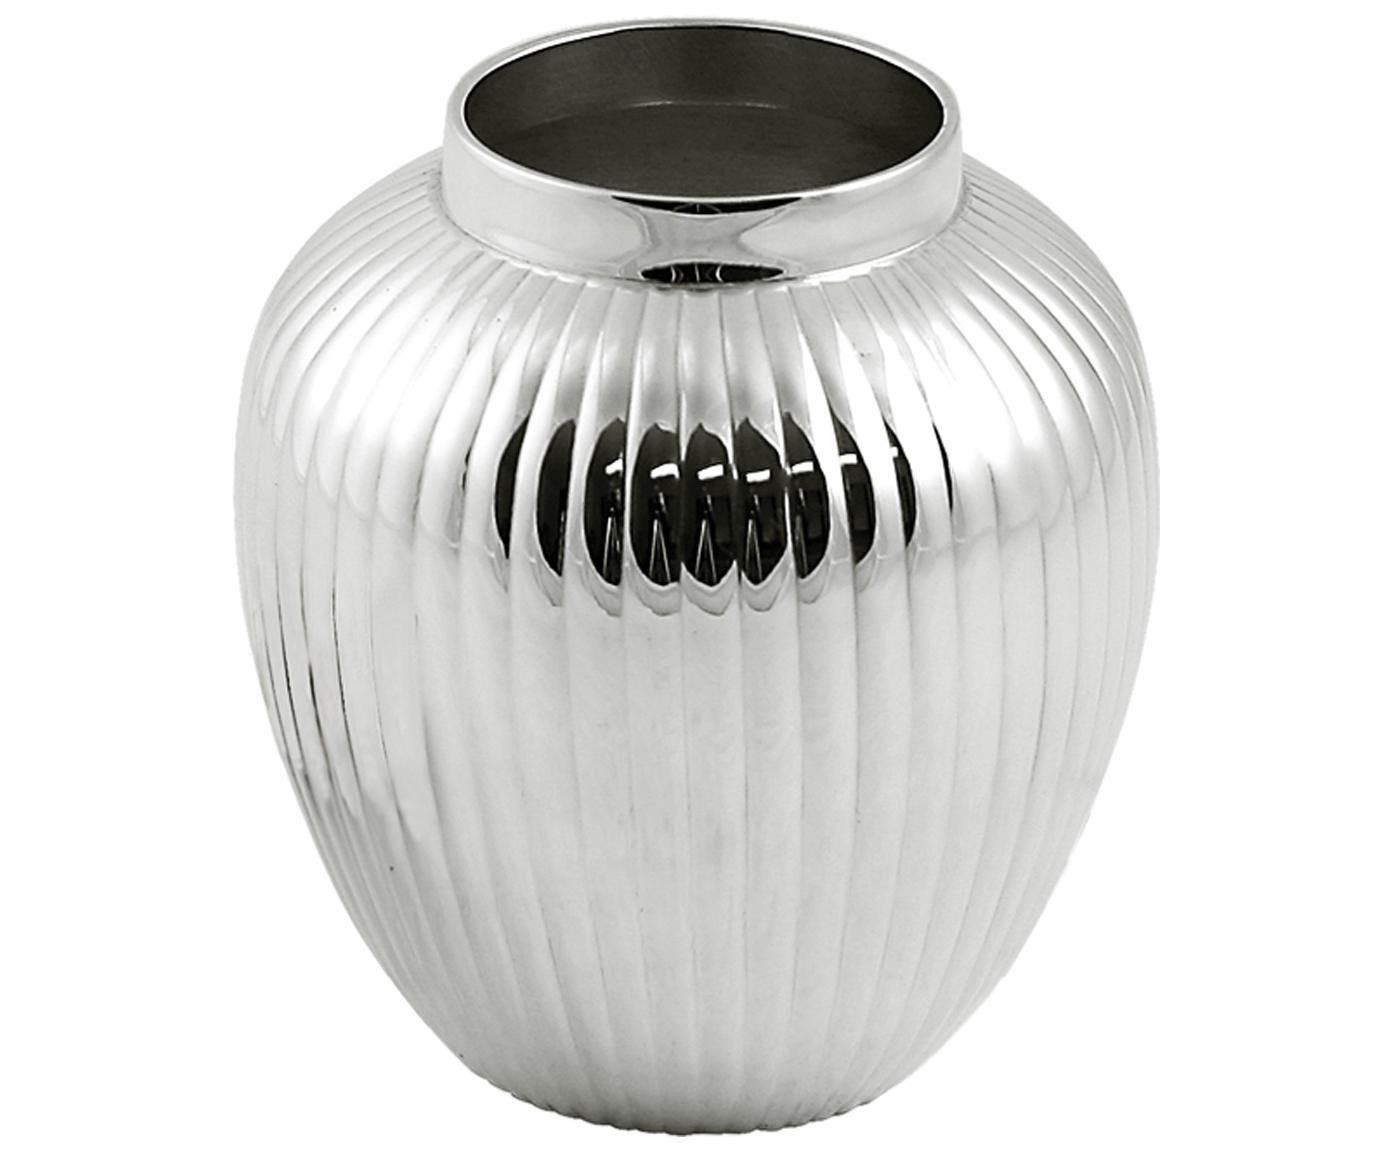 Vase Centra, Messing, versilbert, Silber, H 10 cm